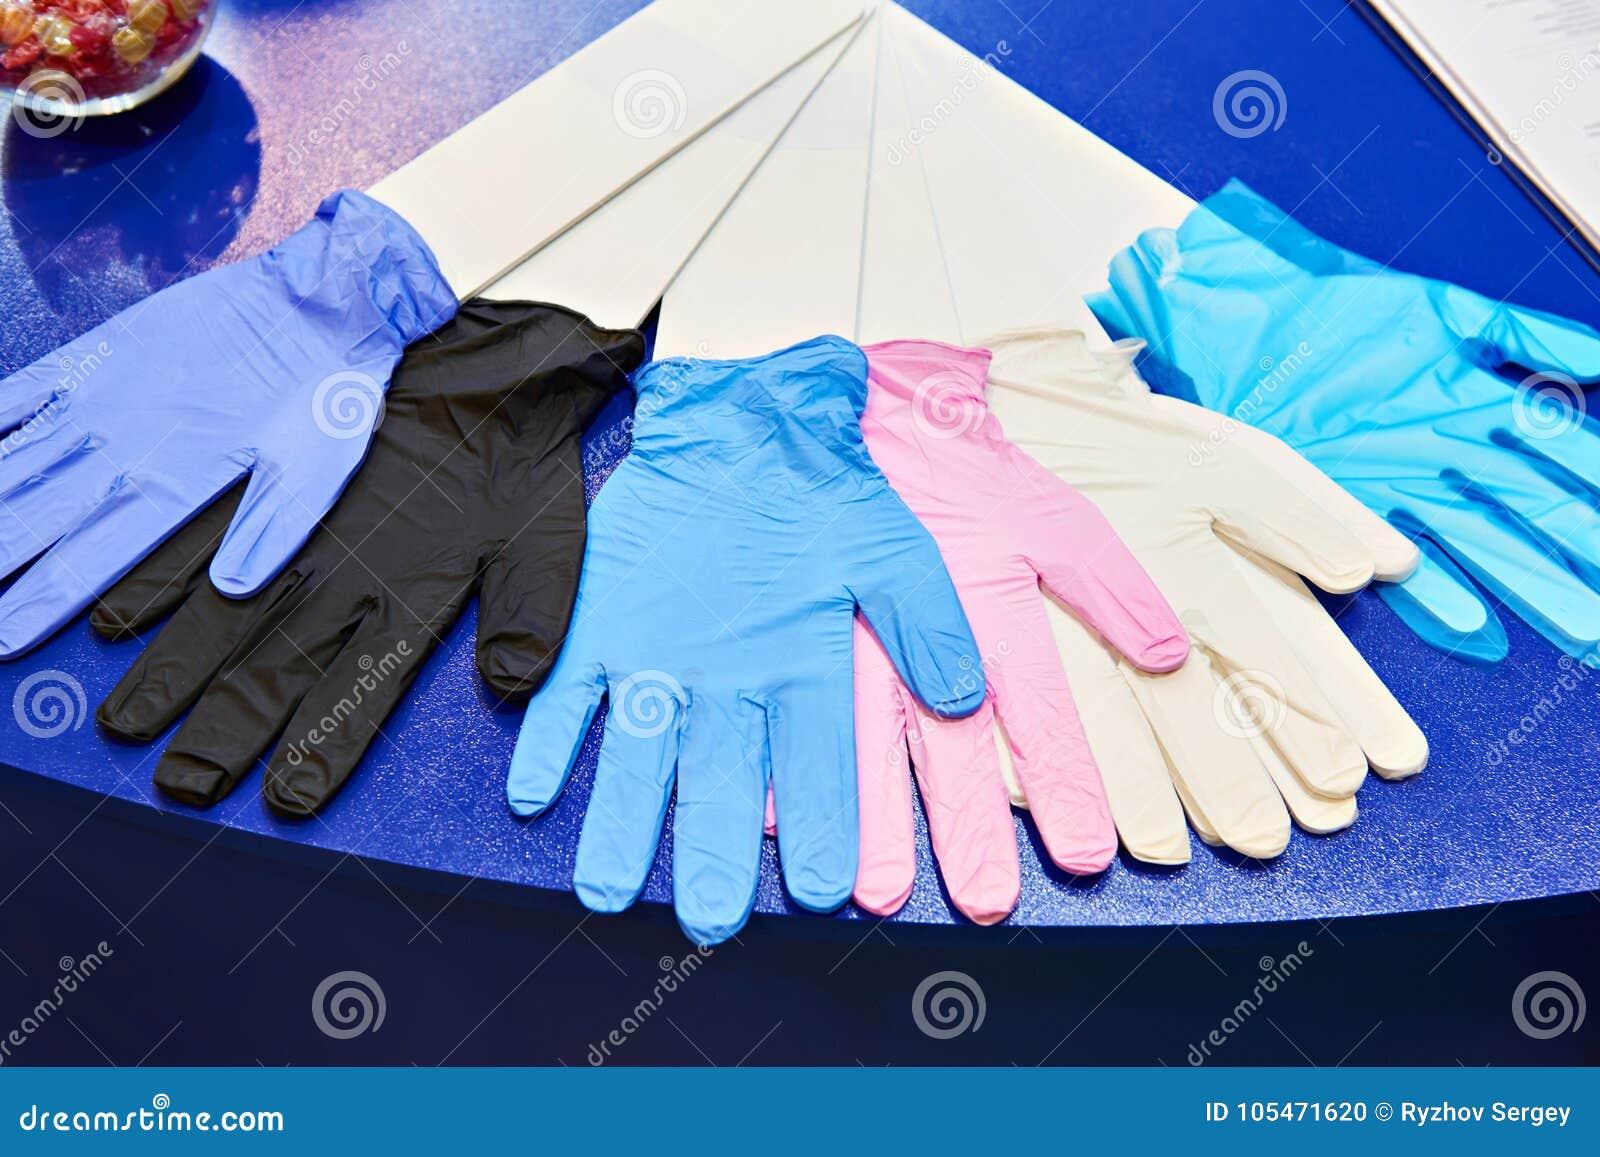 Medical nitrile powder free gloves